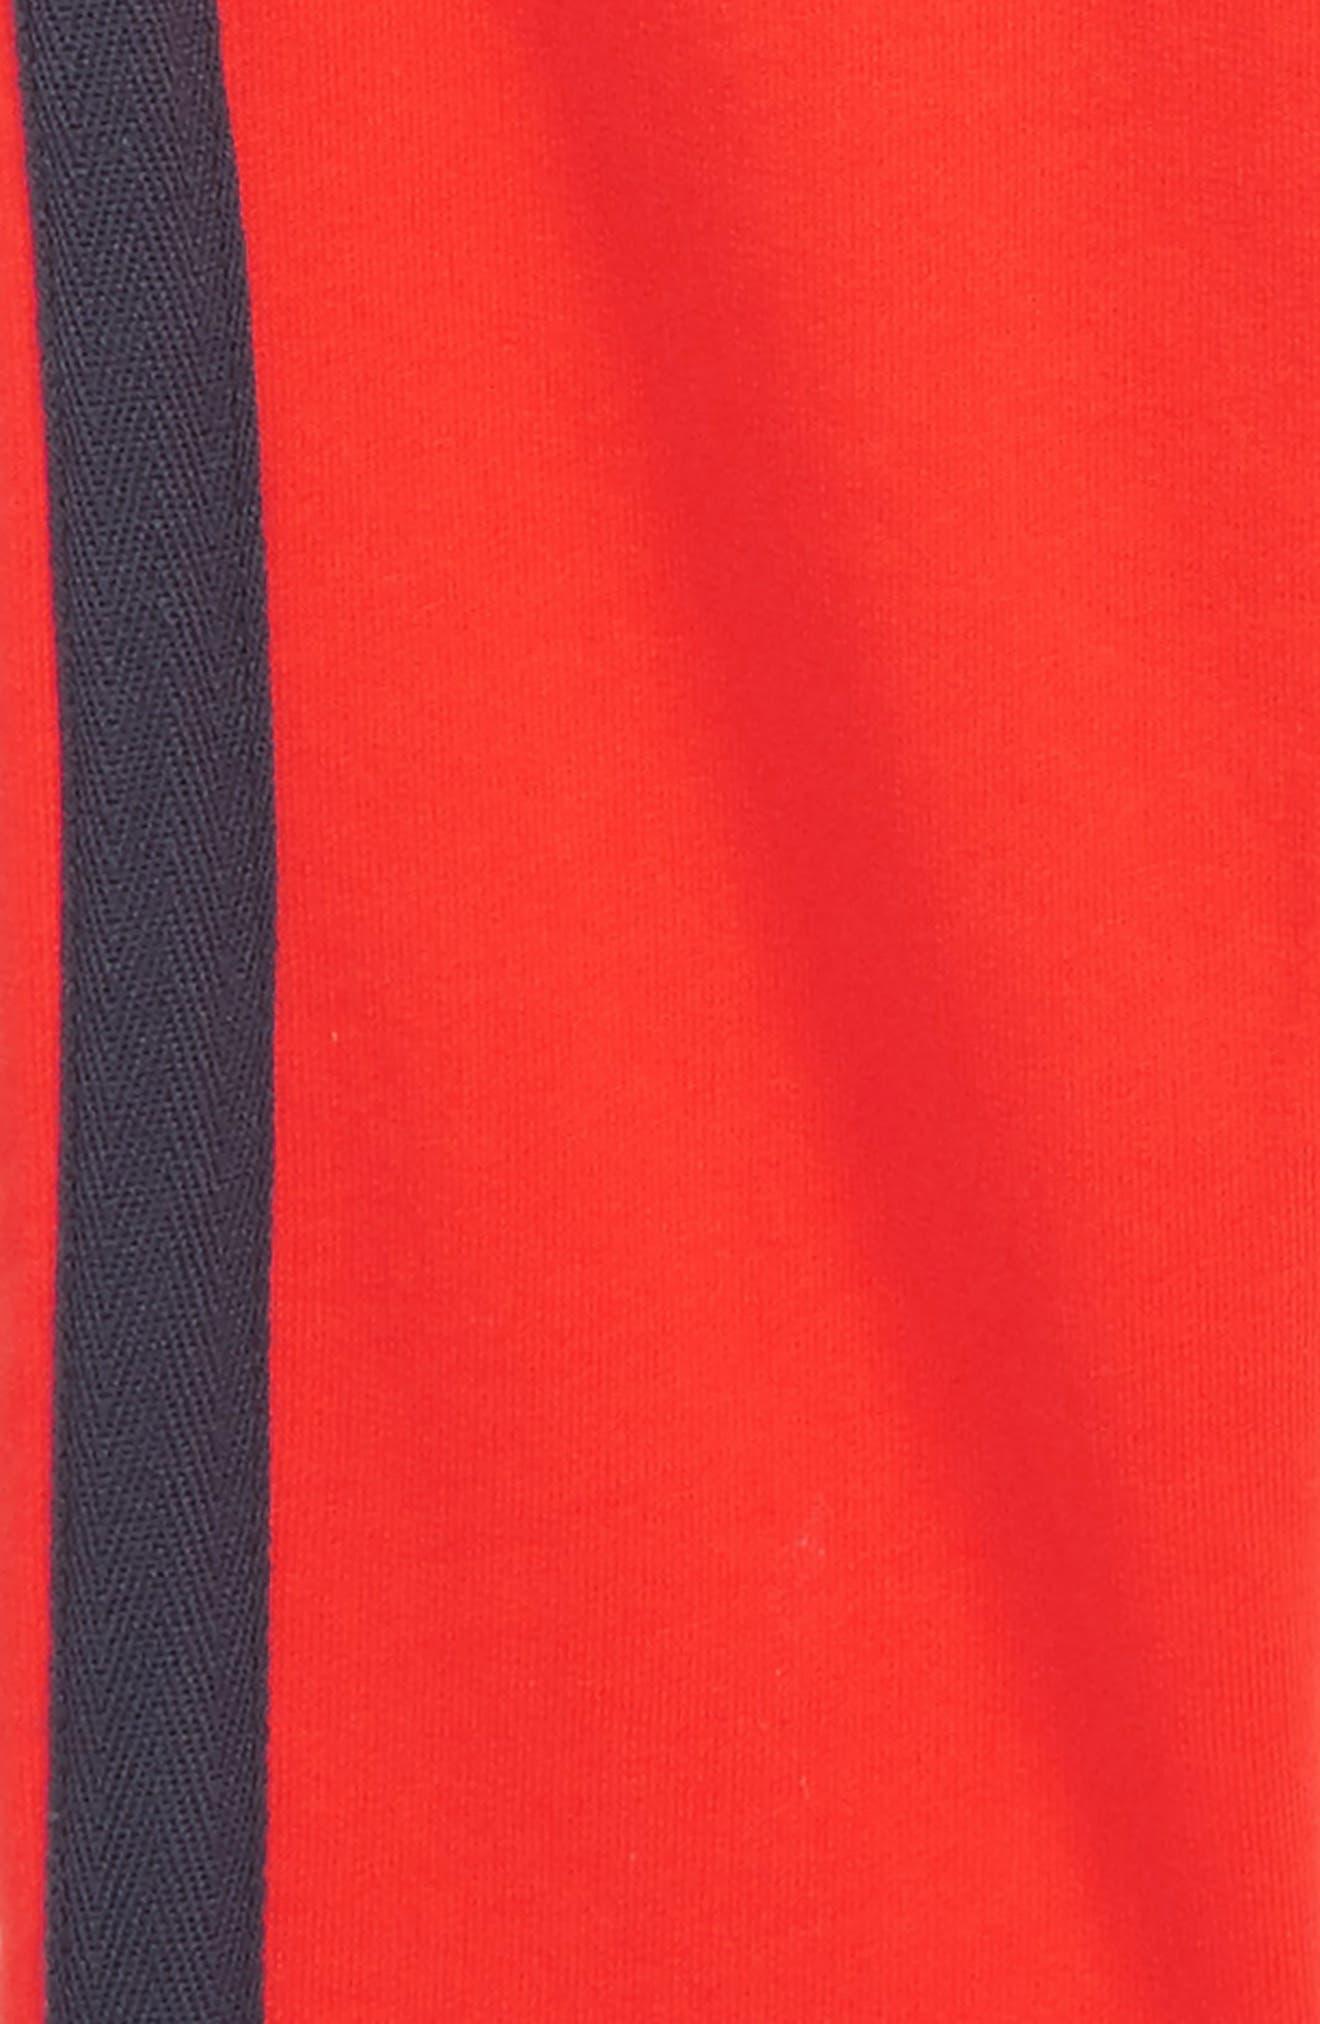 Alternate Image 2  - Tea Collection Side Stripe Knit Pants (Toddler Boys & Little Boys)